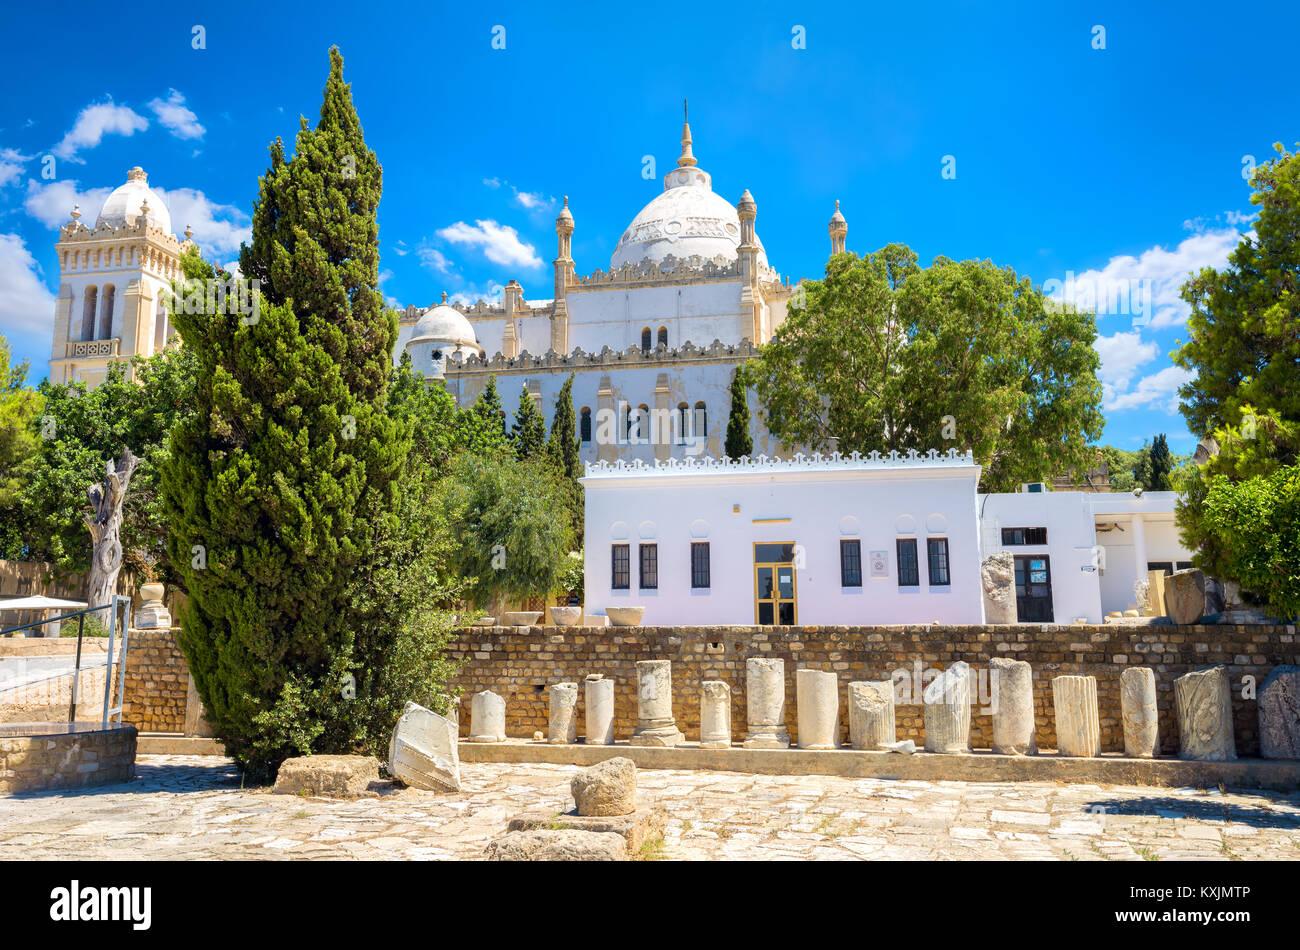 Vista di Saint Louis Cattedrale (Acropolium). Cartagine, Byrsa Hill, Tunisia Immagini Stock